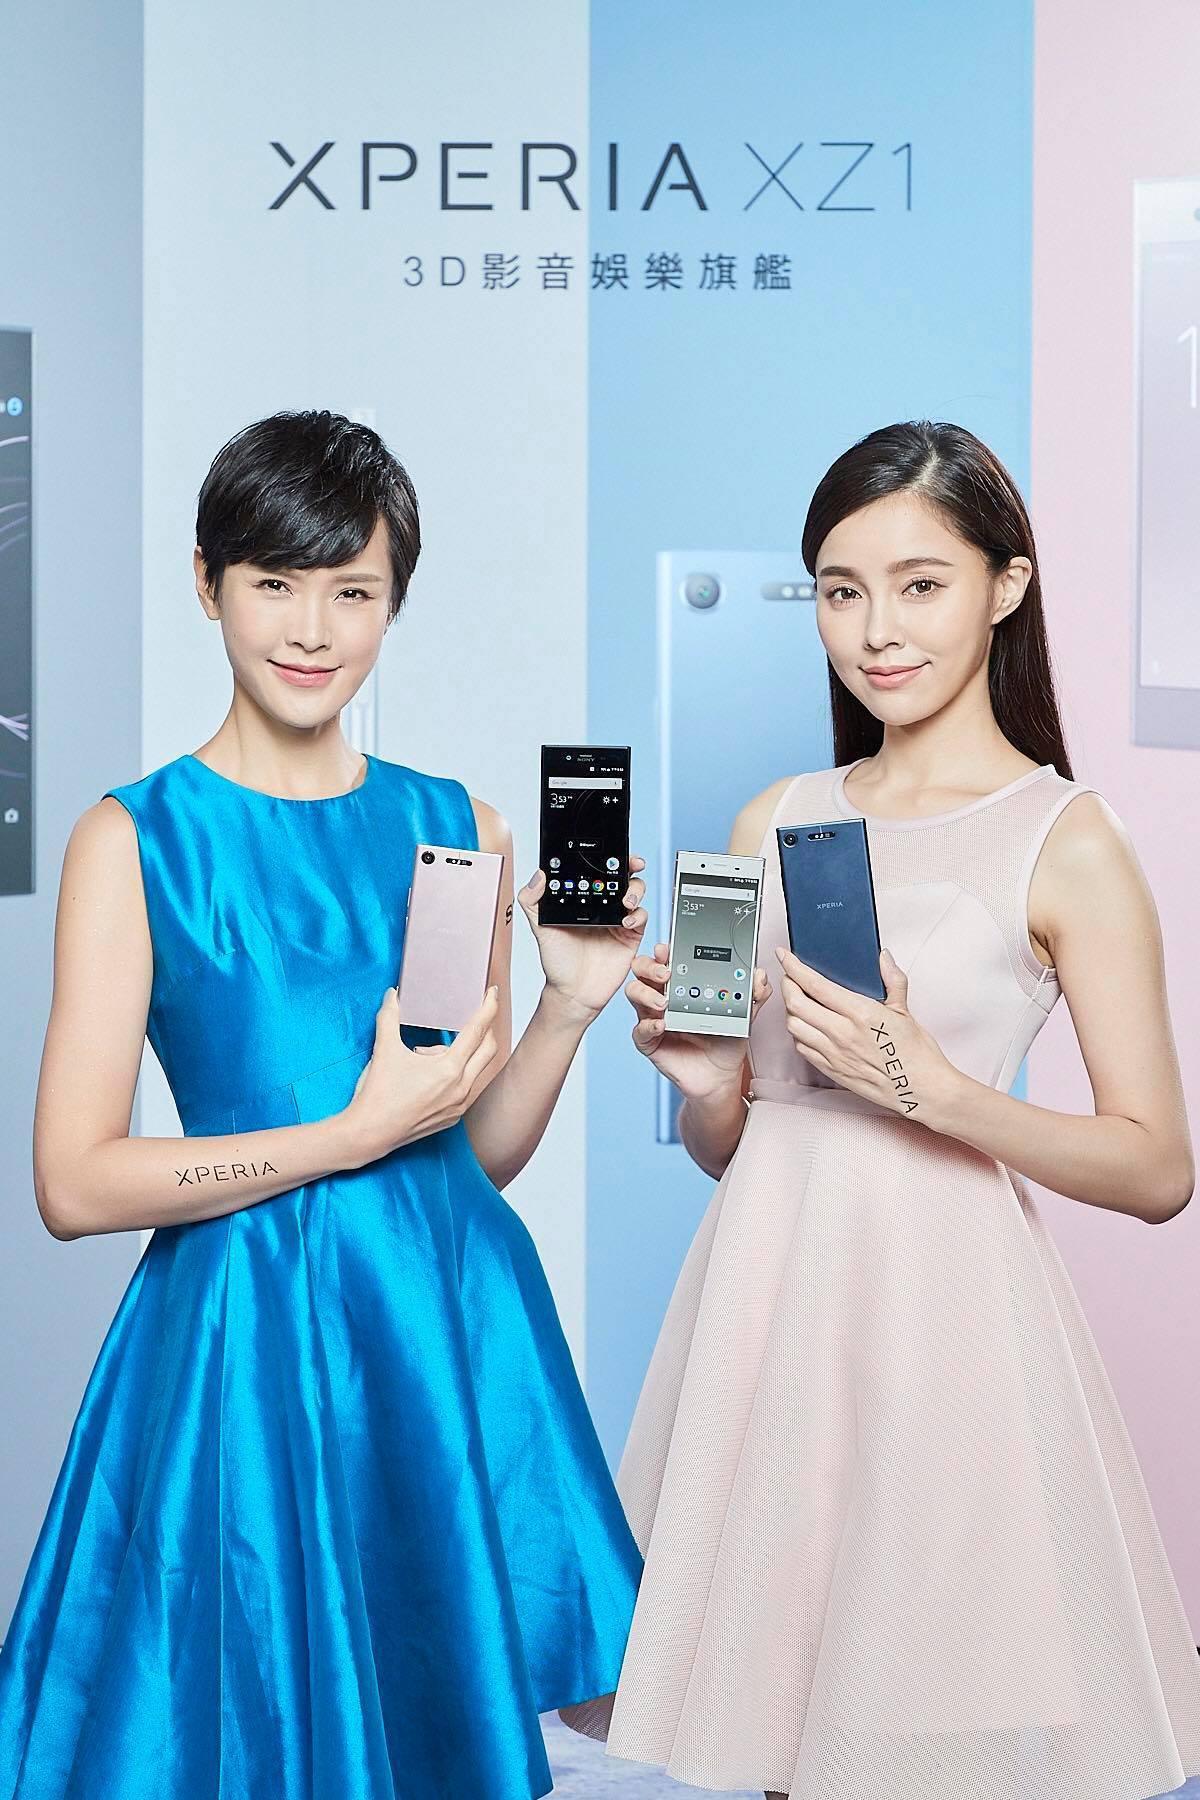 Sony Xperia XZ1擁有5.2吋Full HD的HDR螢幕與流暢無接縫...